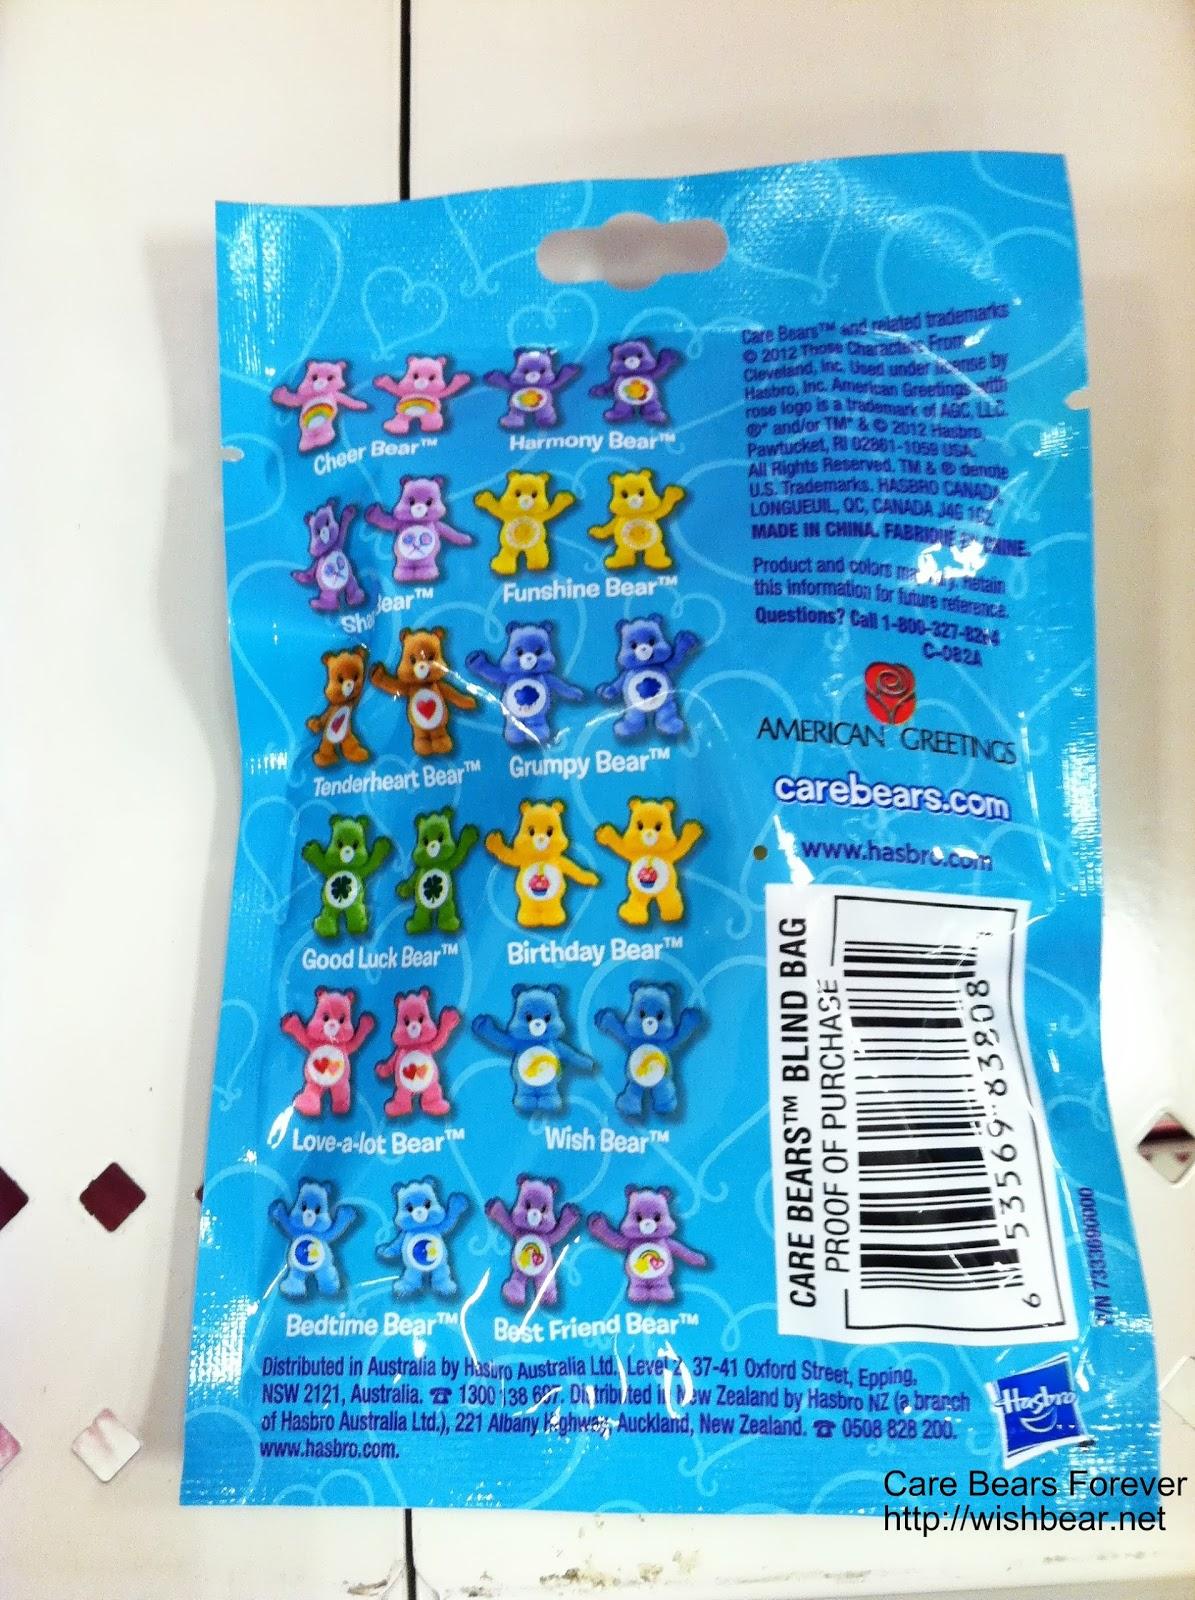 Care Bears Forever Care Bears Figure Mystery Case Pack